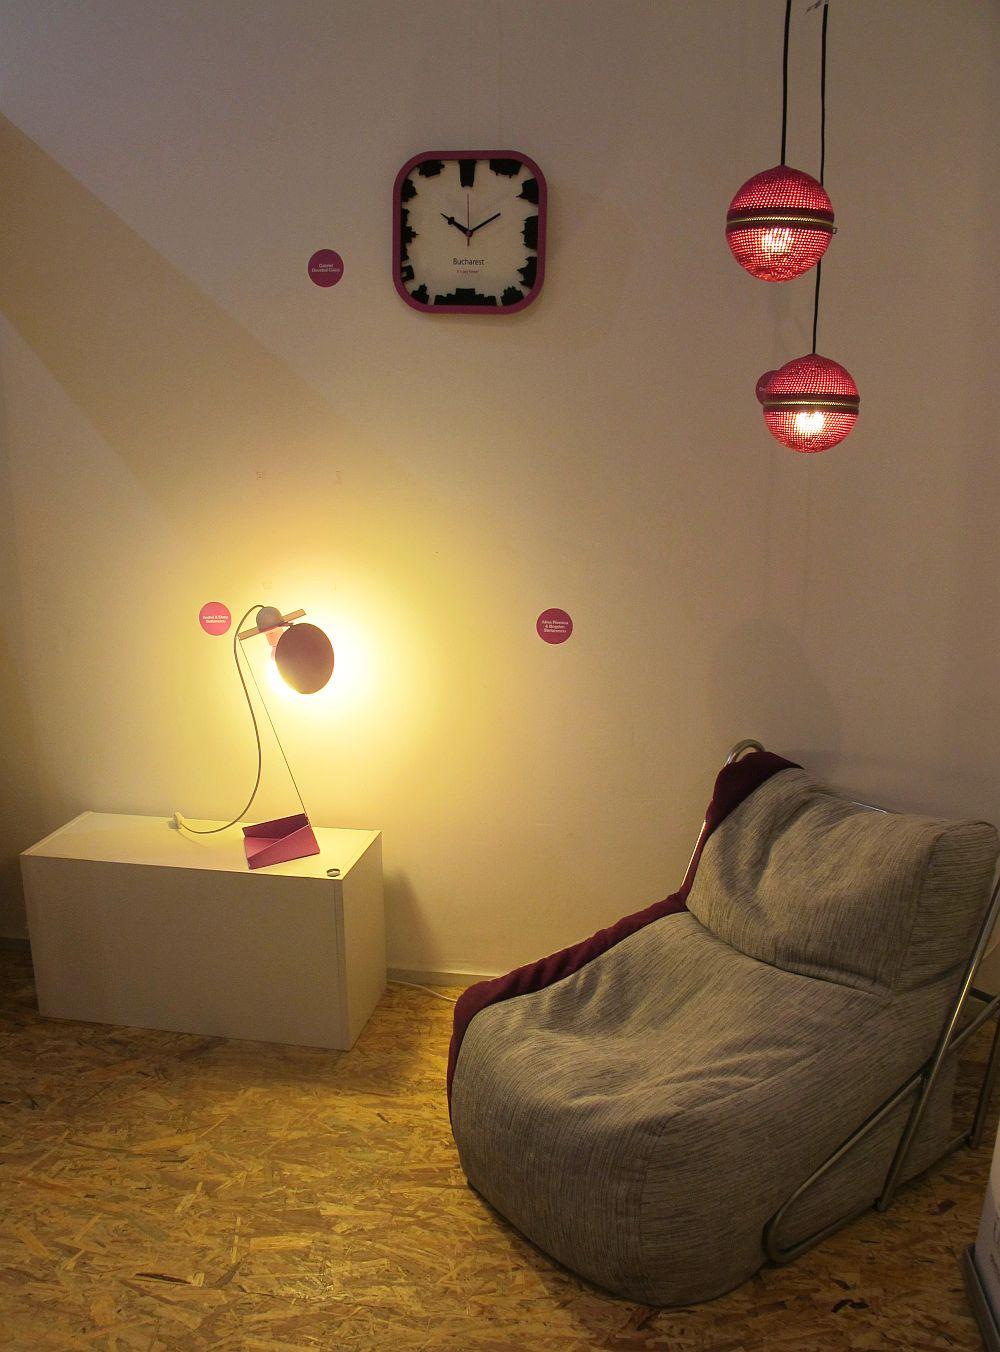 adelaparvu.com despre despre expozitia CID, Limited Edition Romanian Design, Pantone Radiant Orchid 2014